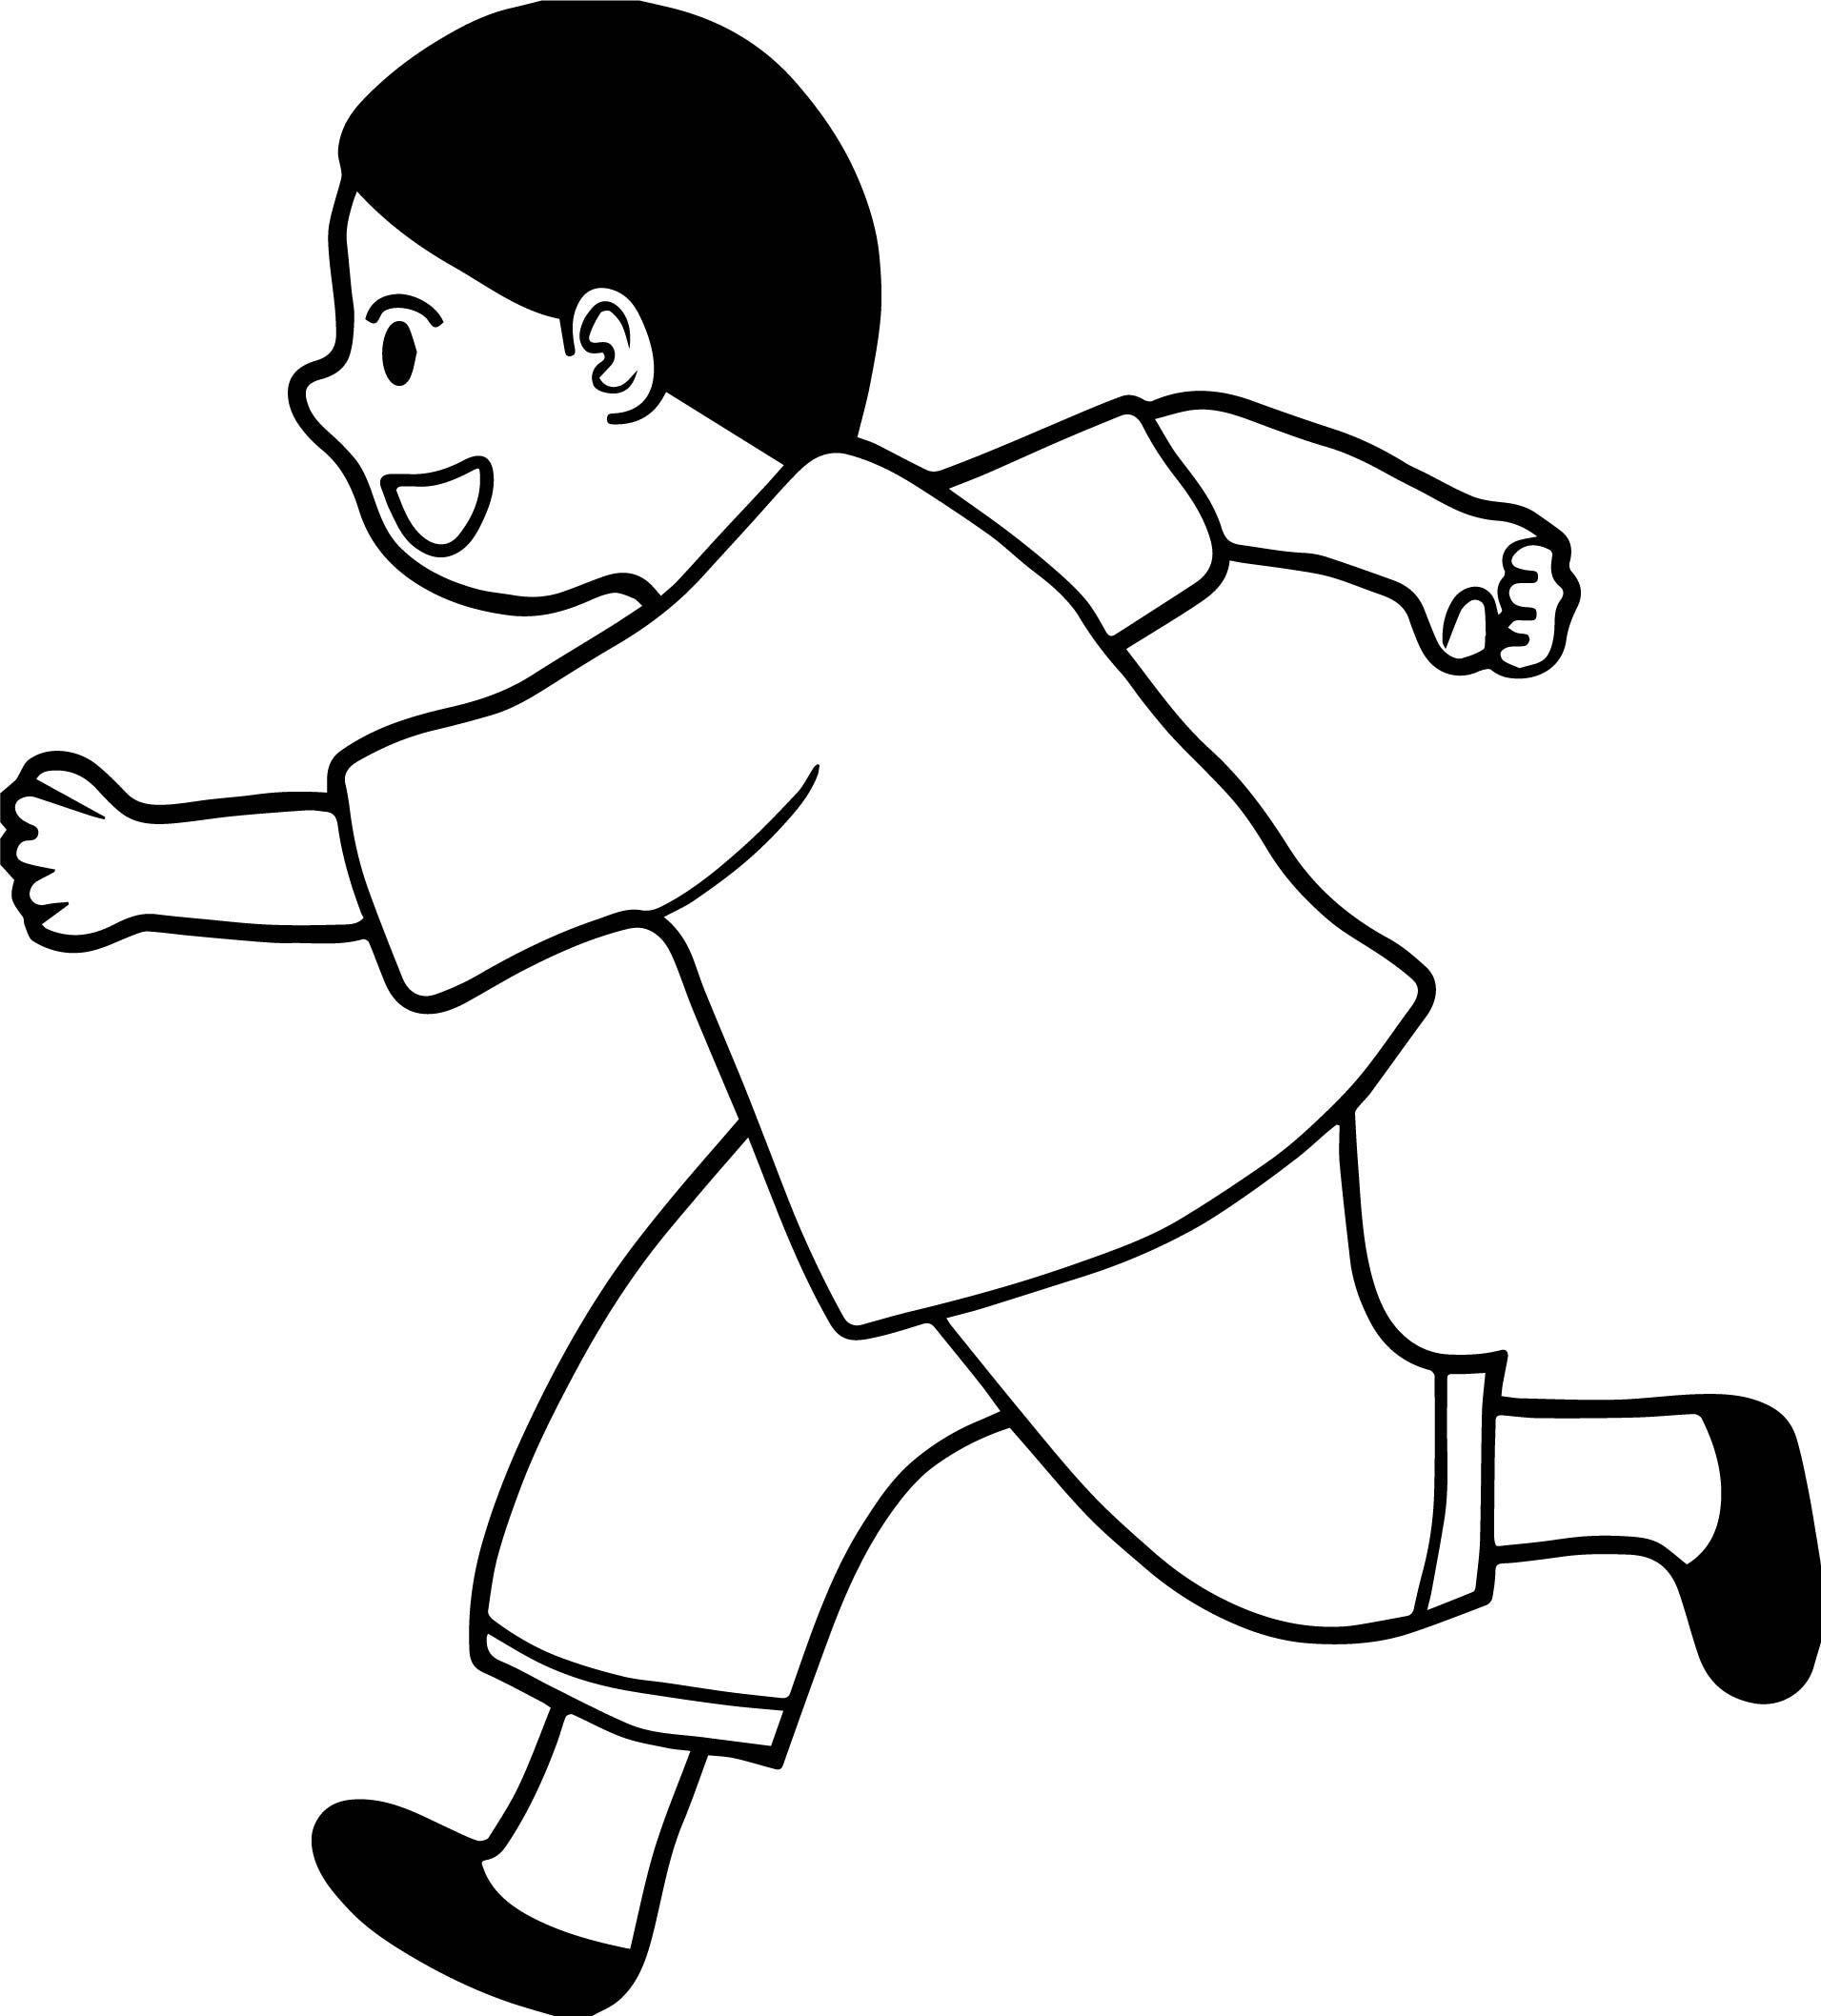 Nice Running Black Hair Boy Coloring Page Coloring Pages For Boys Black Hair Boy Coloring